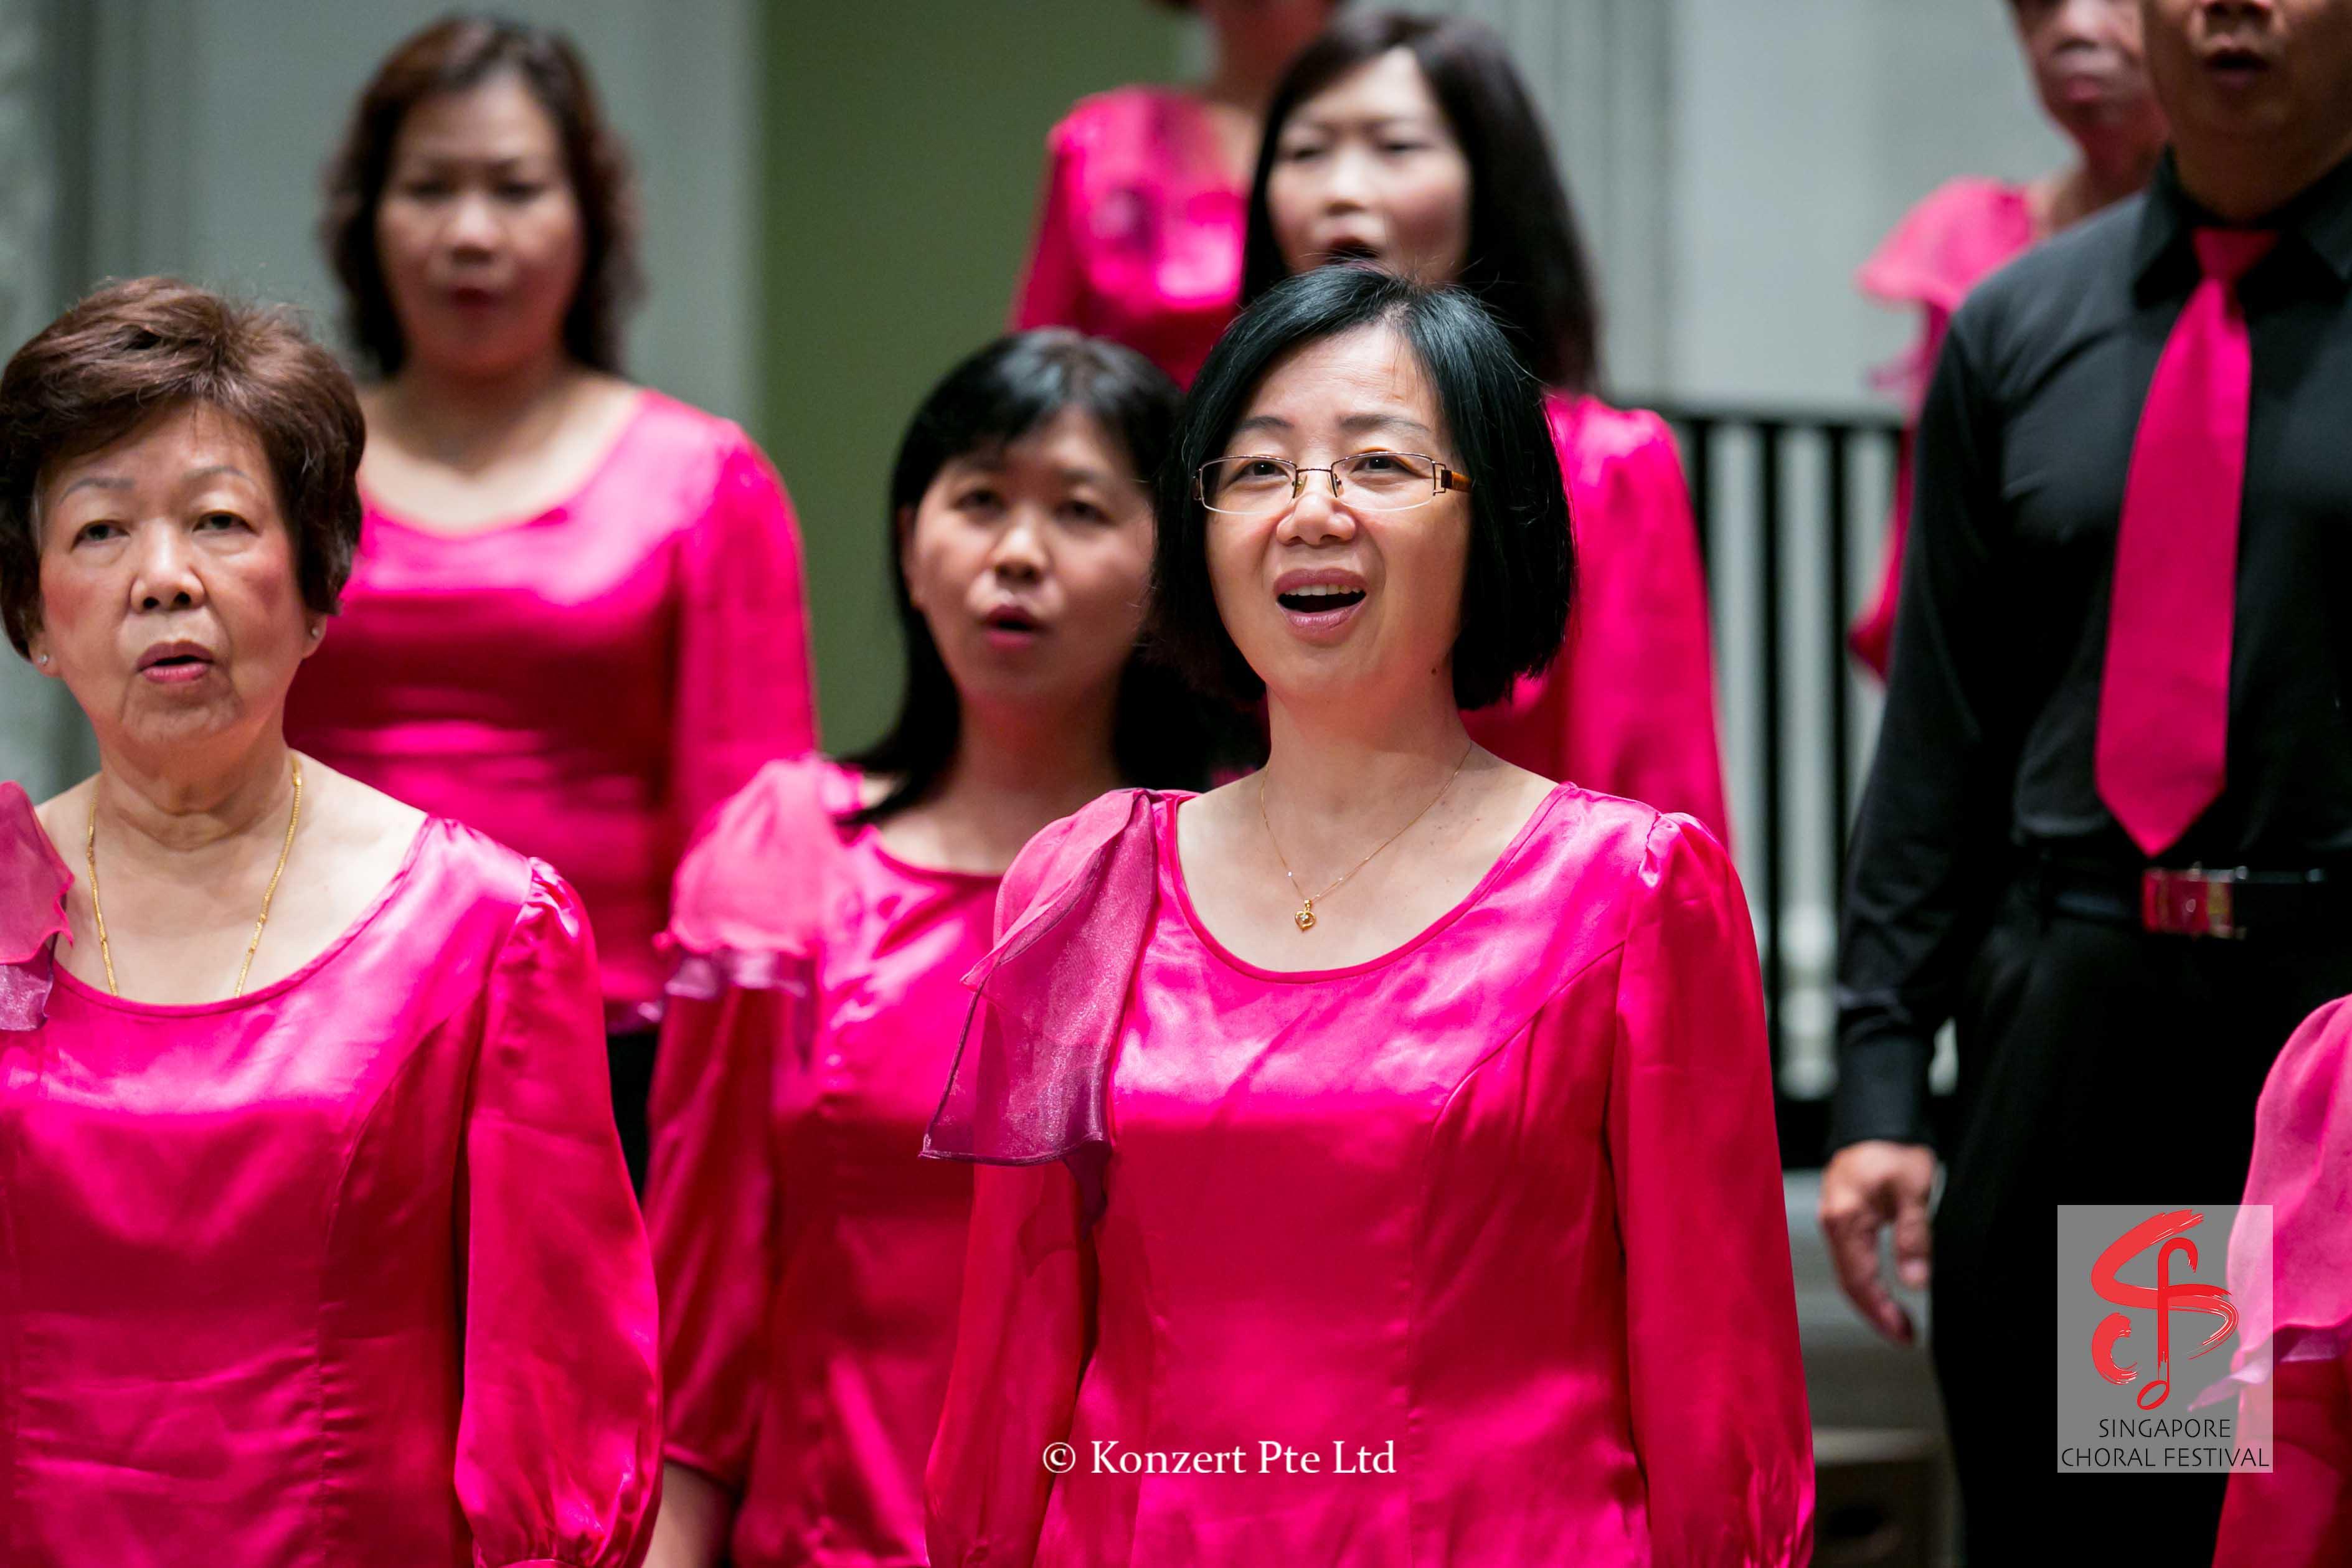 Singapore Choral Festival 7-8-15 (21).jpg